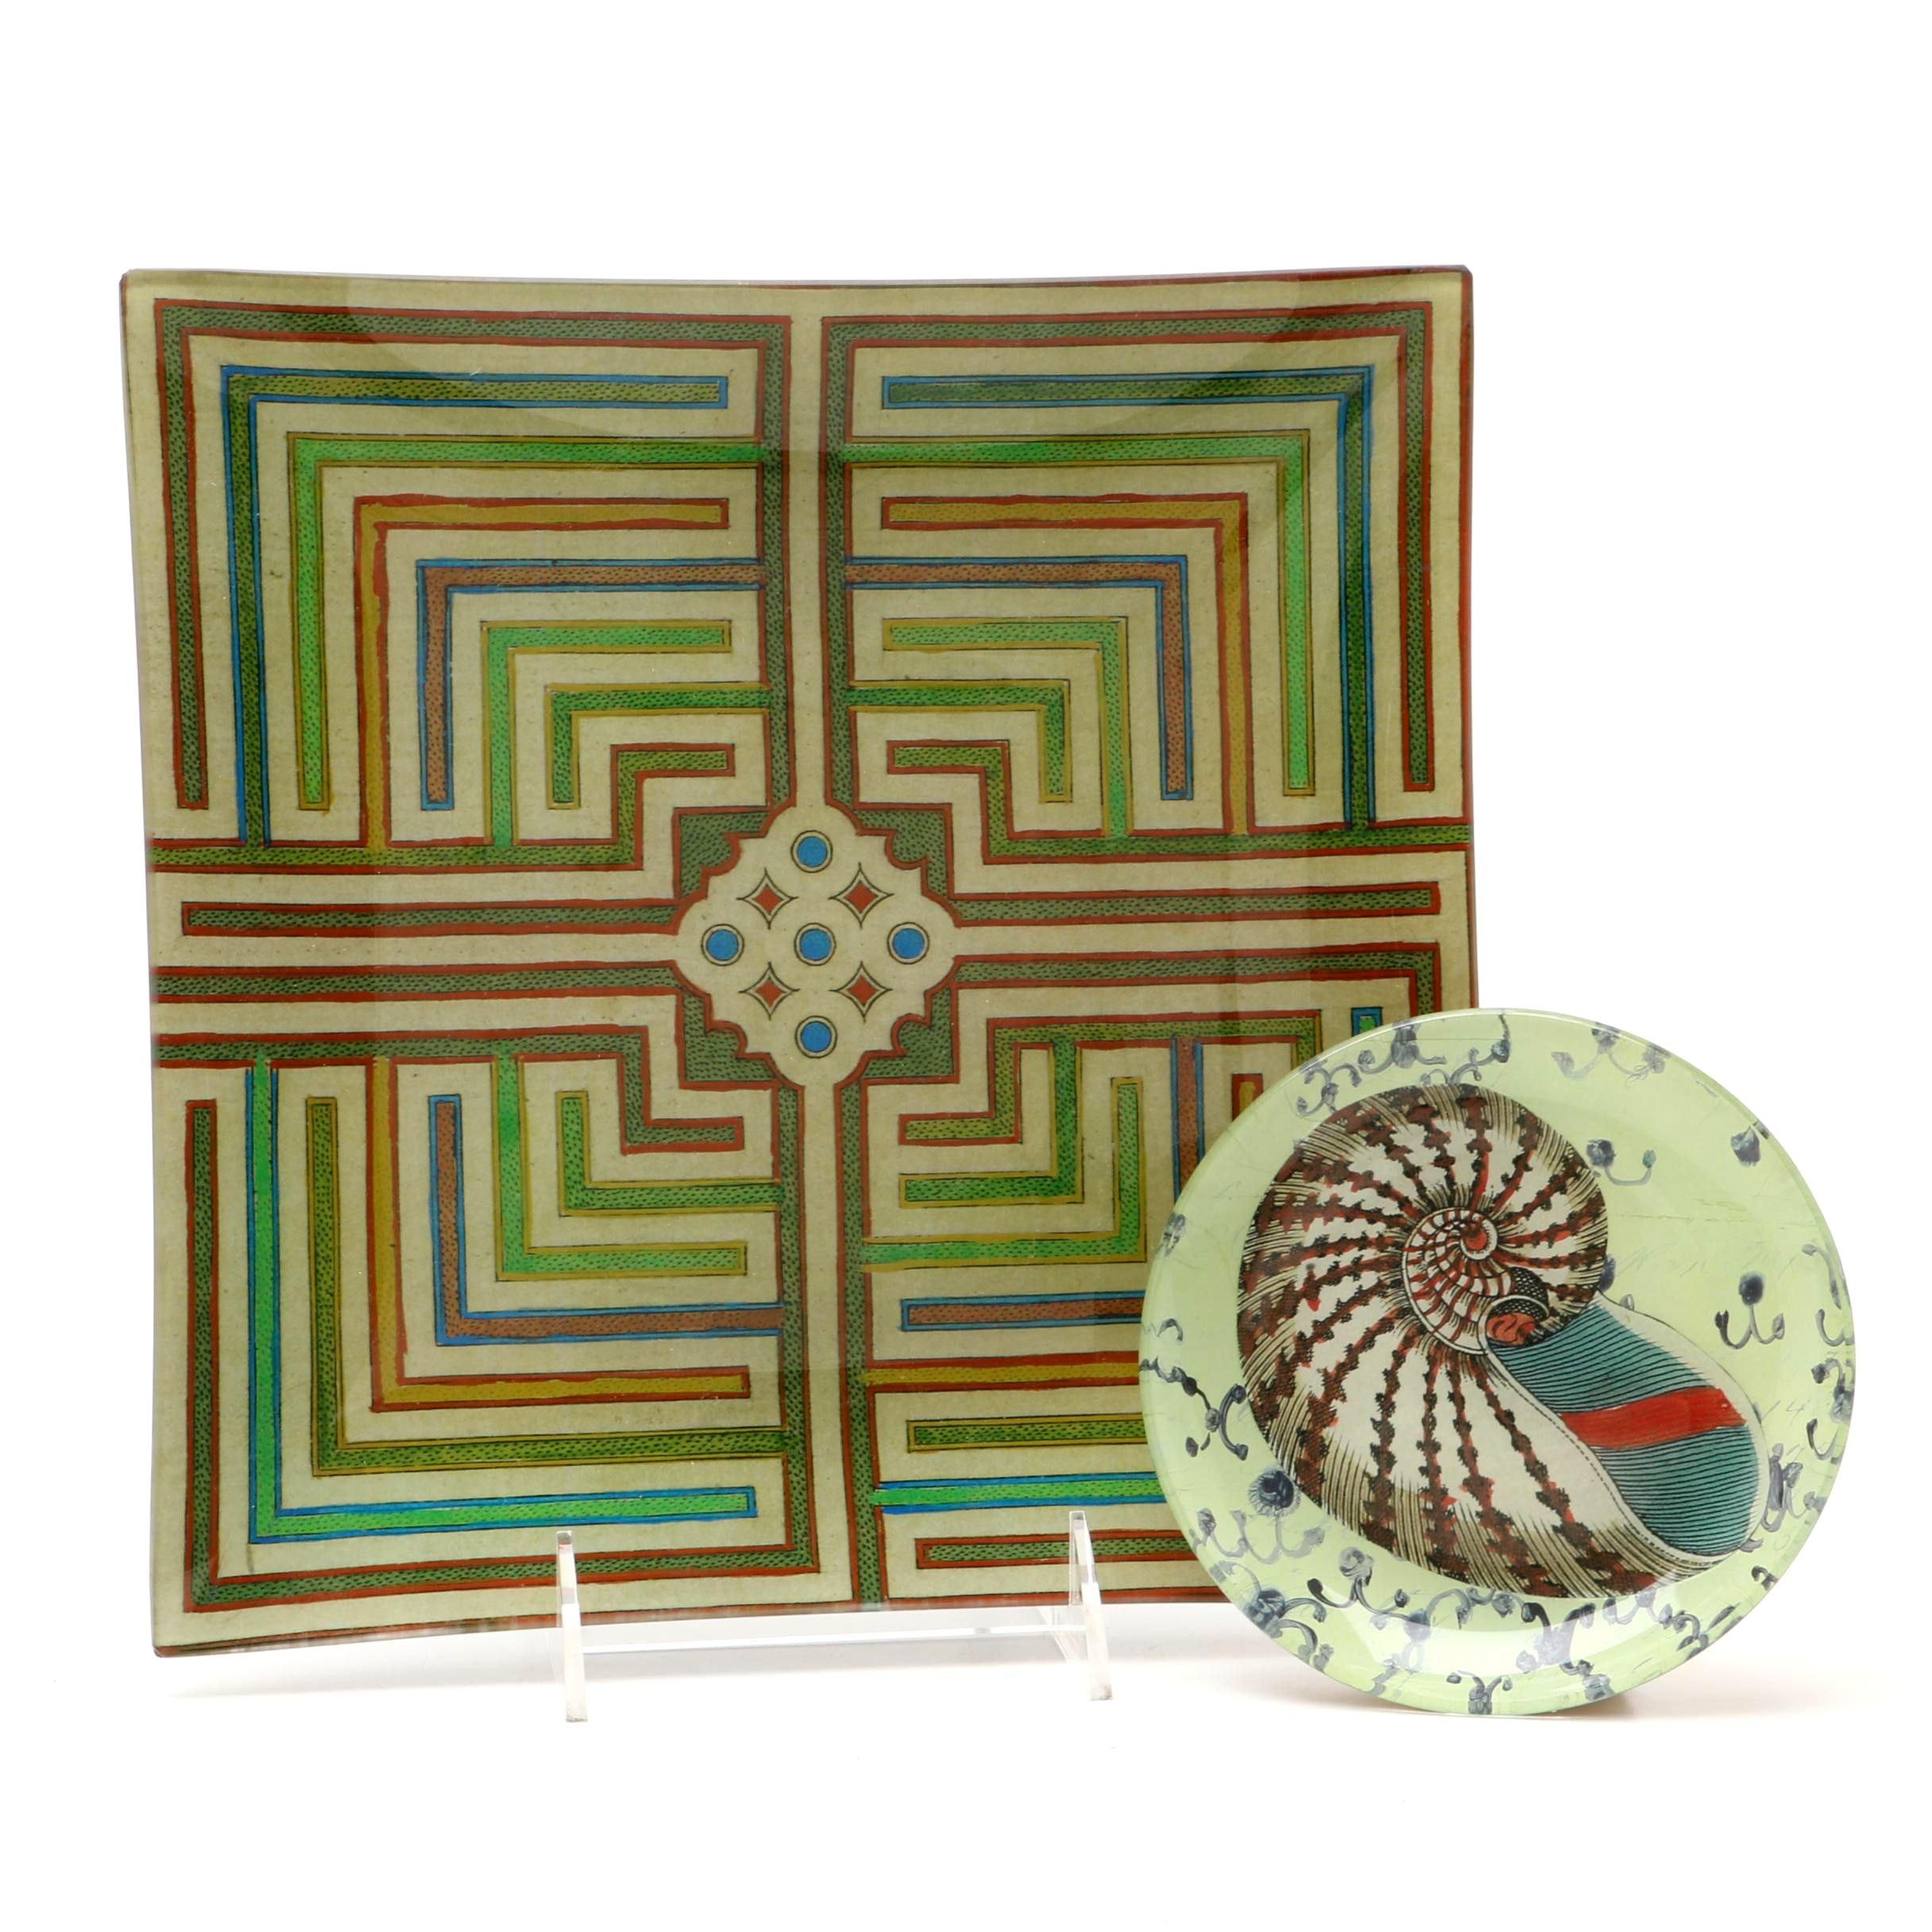 Signed John Derian Handmade Plates